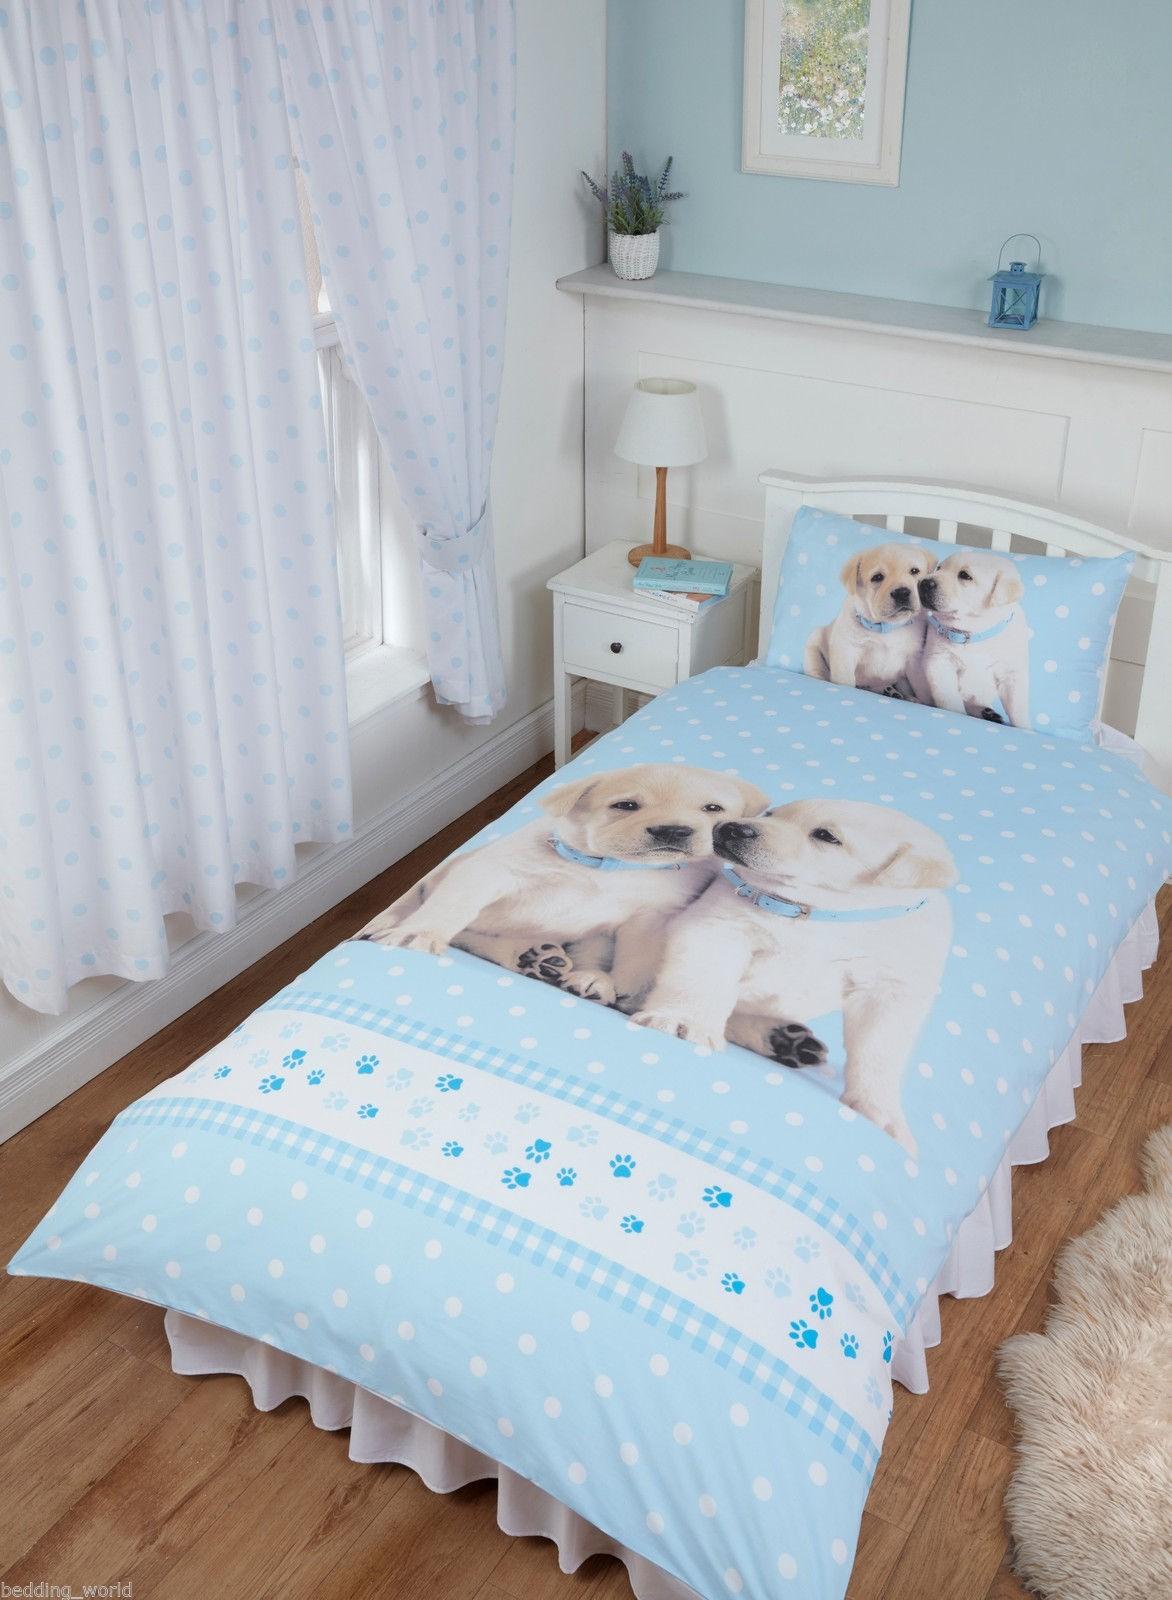 Single Size Luke & Leia Cute Labrador Puppies Design Reversible Duvet Cover & Matching Pillowcase